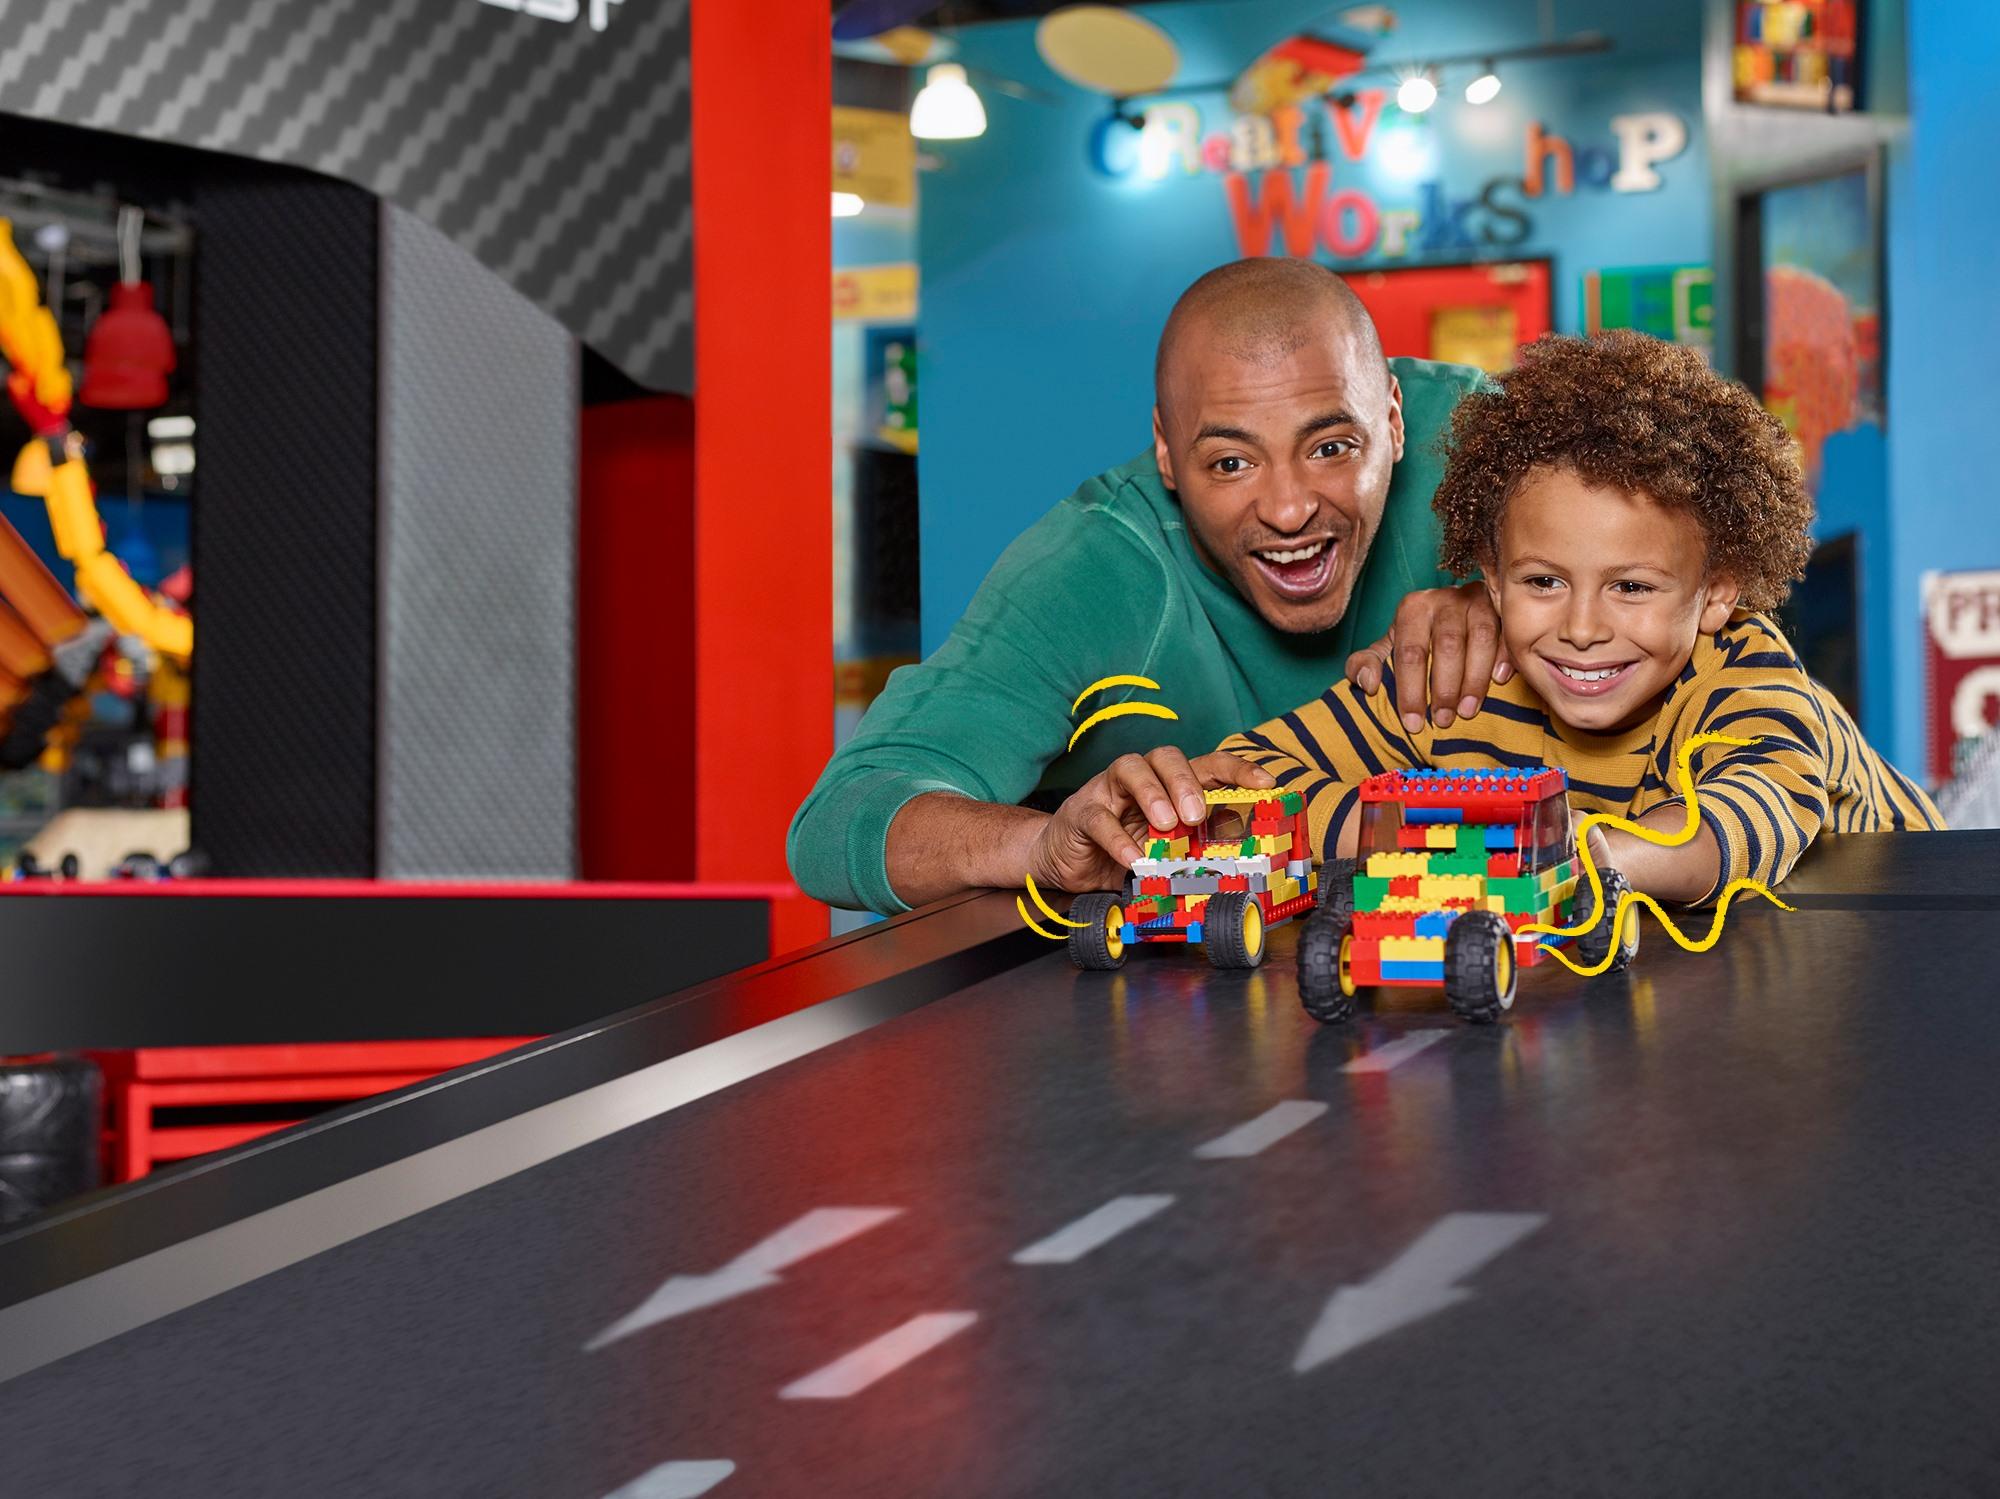 Legoland Discovery Center Dallas/Fort Worth